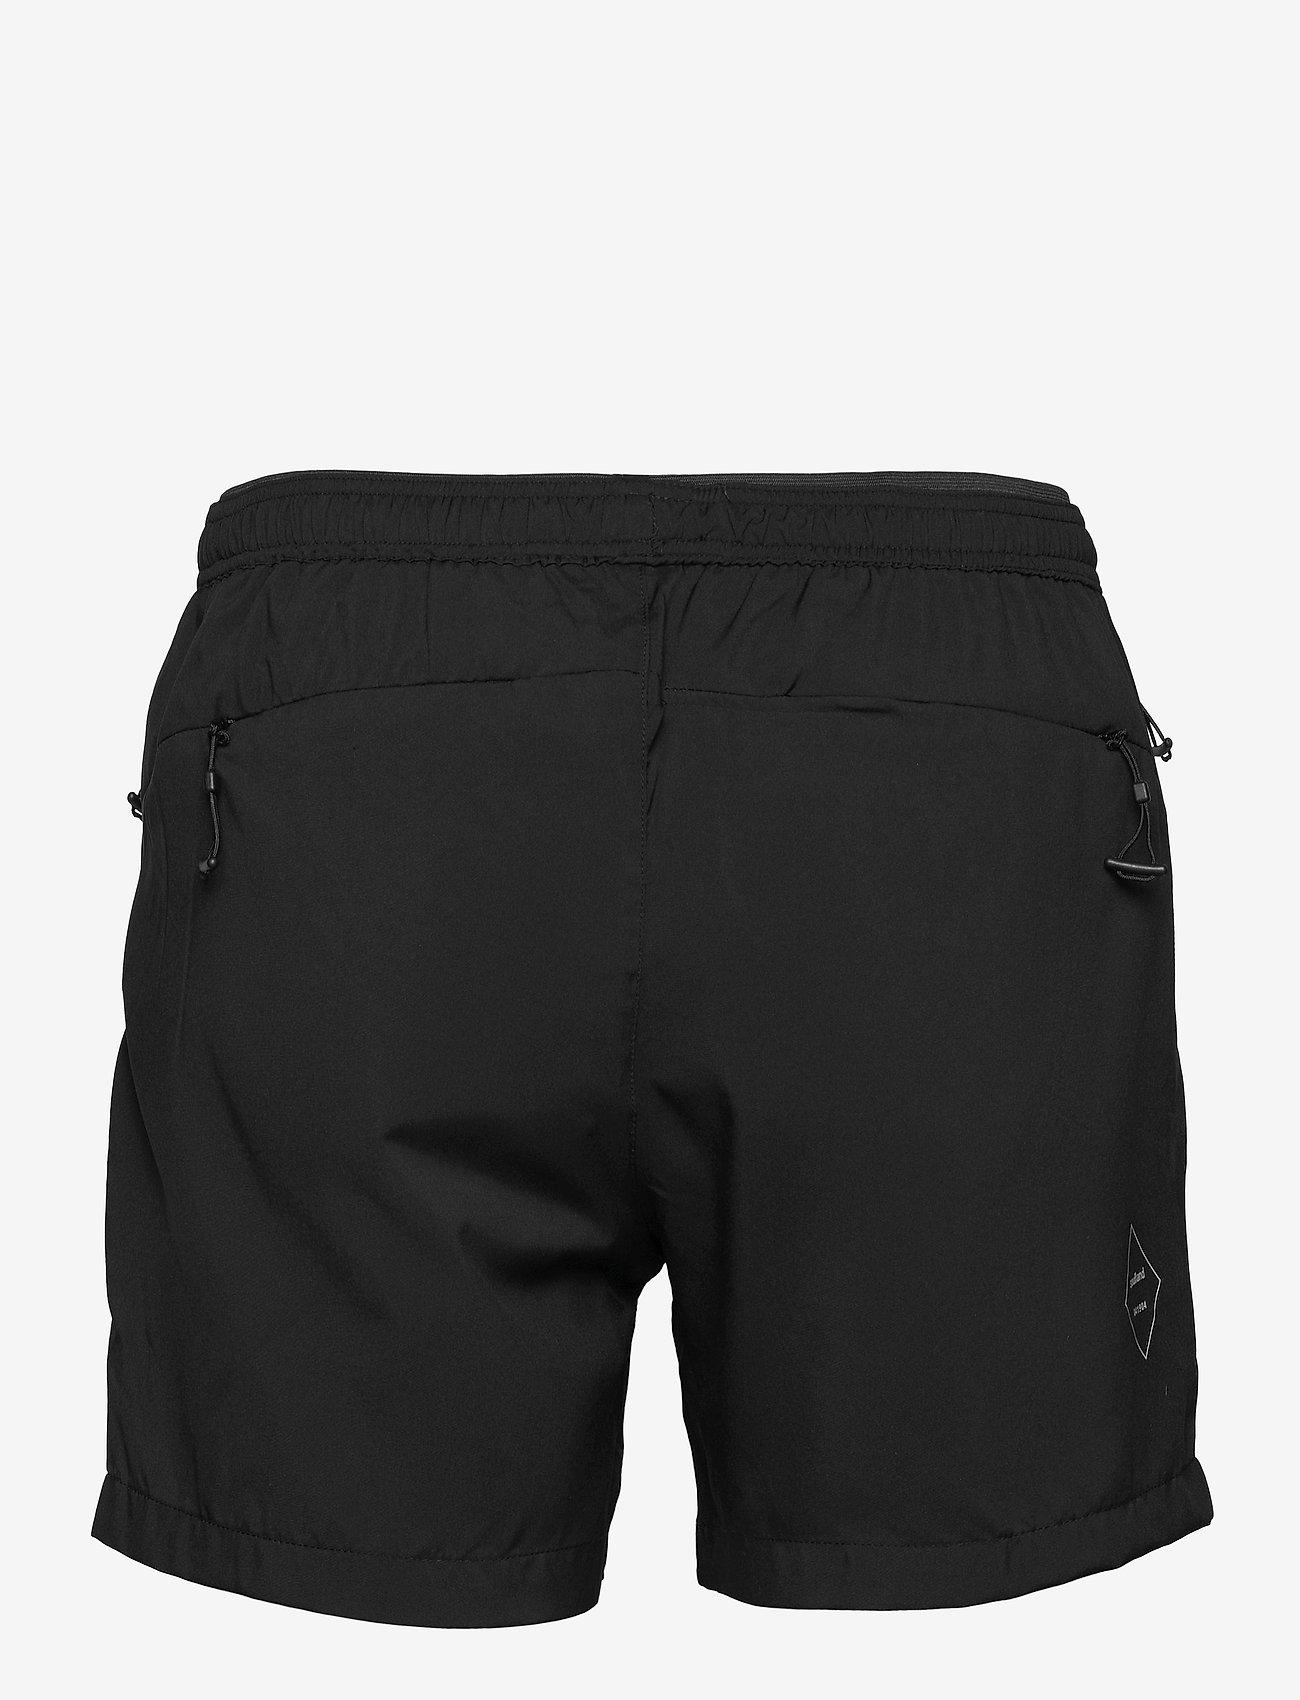 Soulland - Harley shorts - krótkie spodenki - black - 2